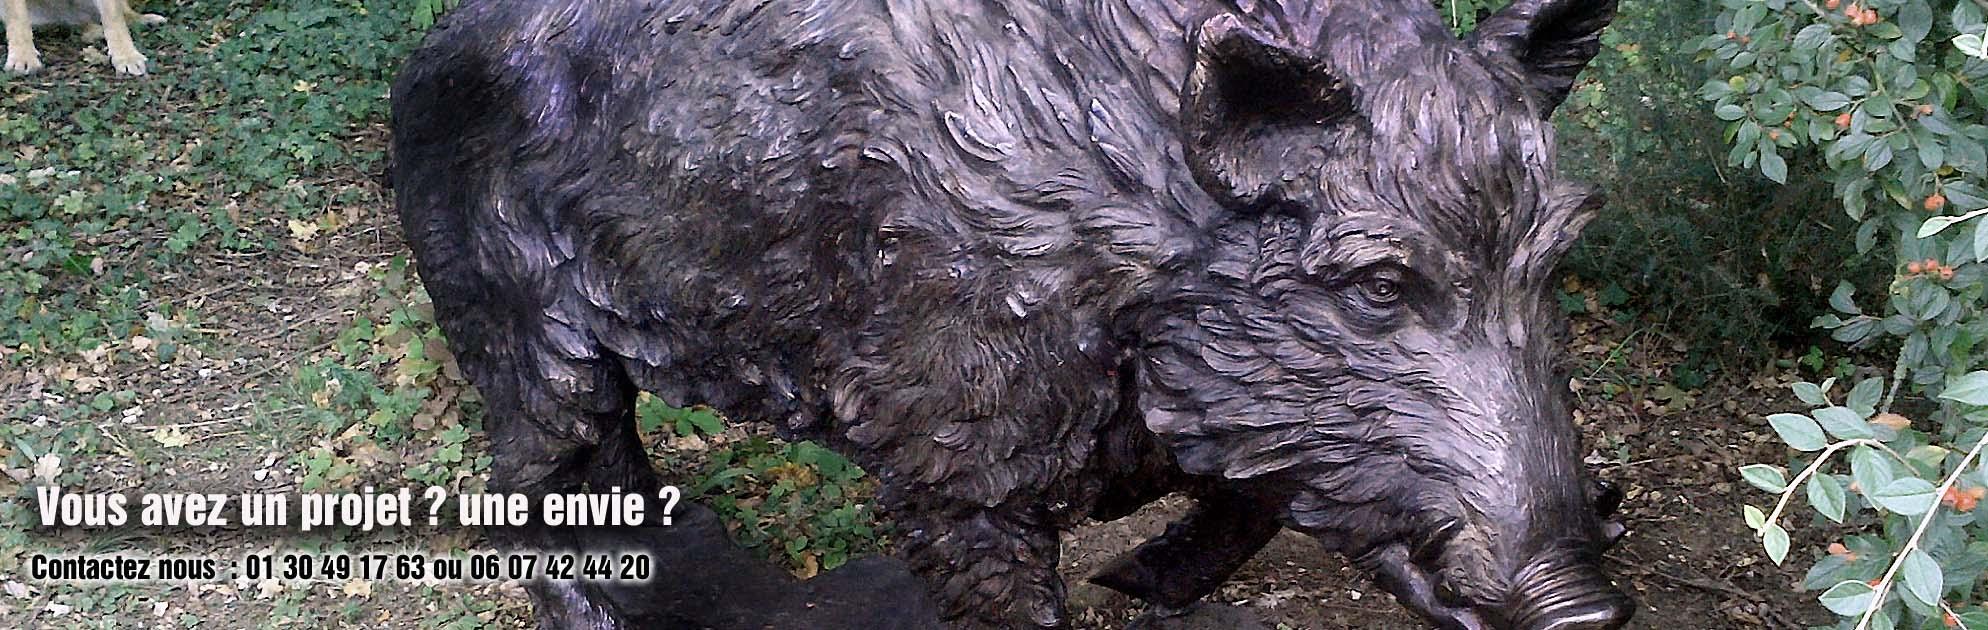 sculpture de sanglier en bronze